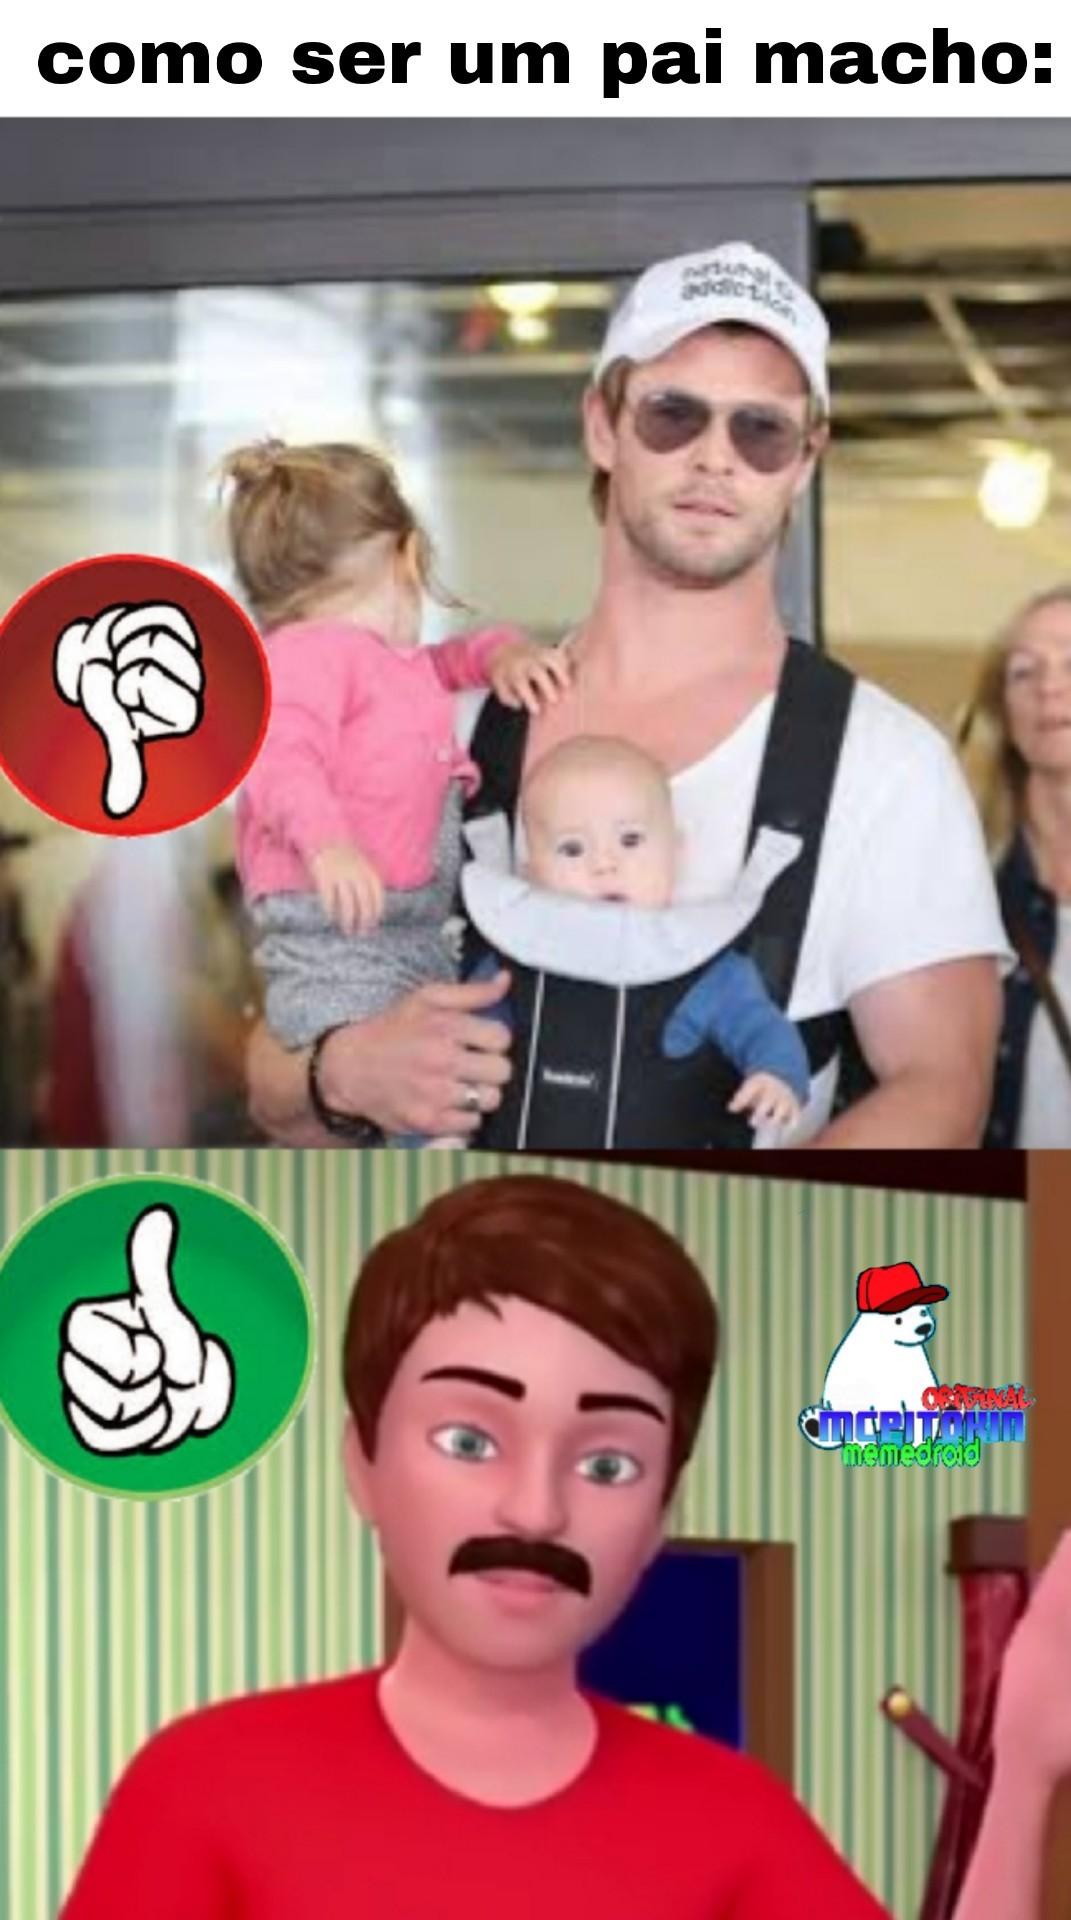 Yes papa macho - meme